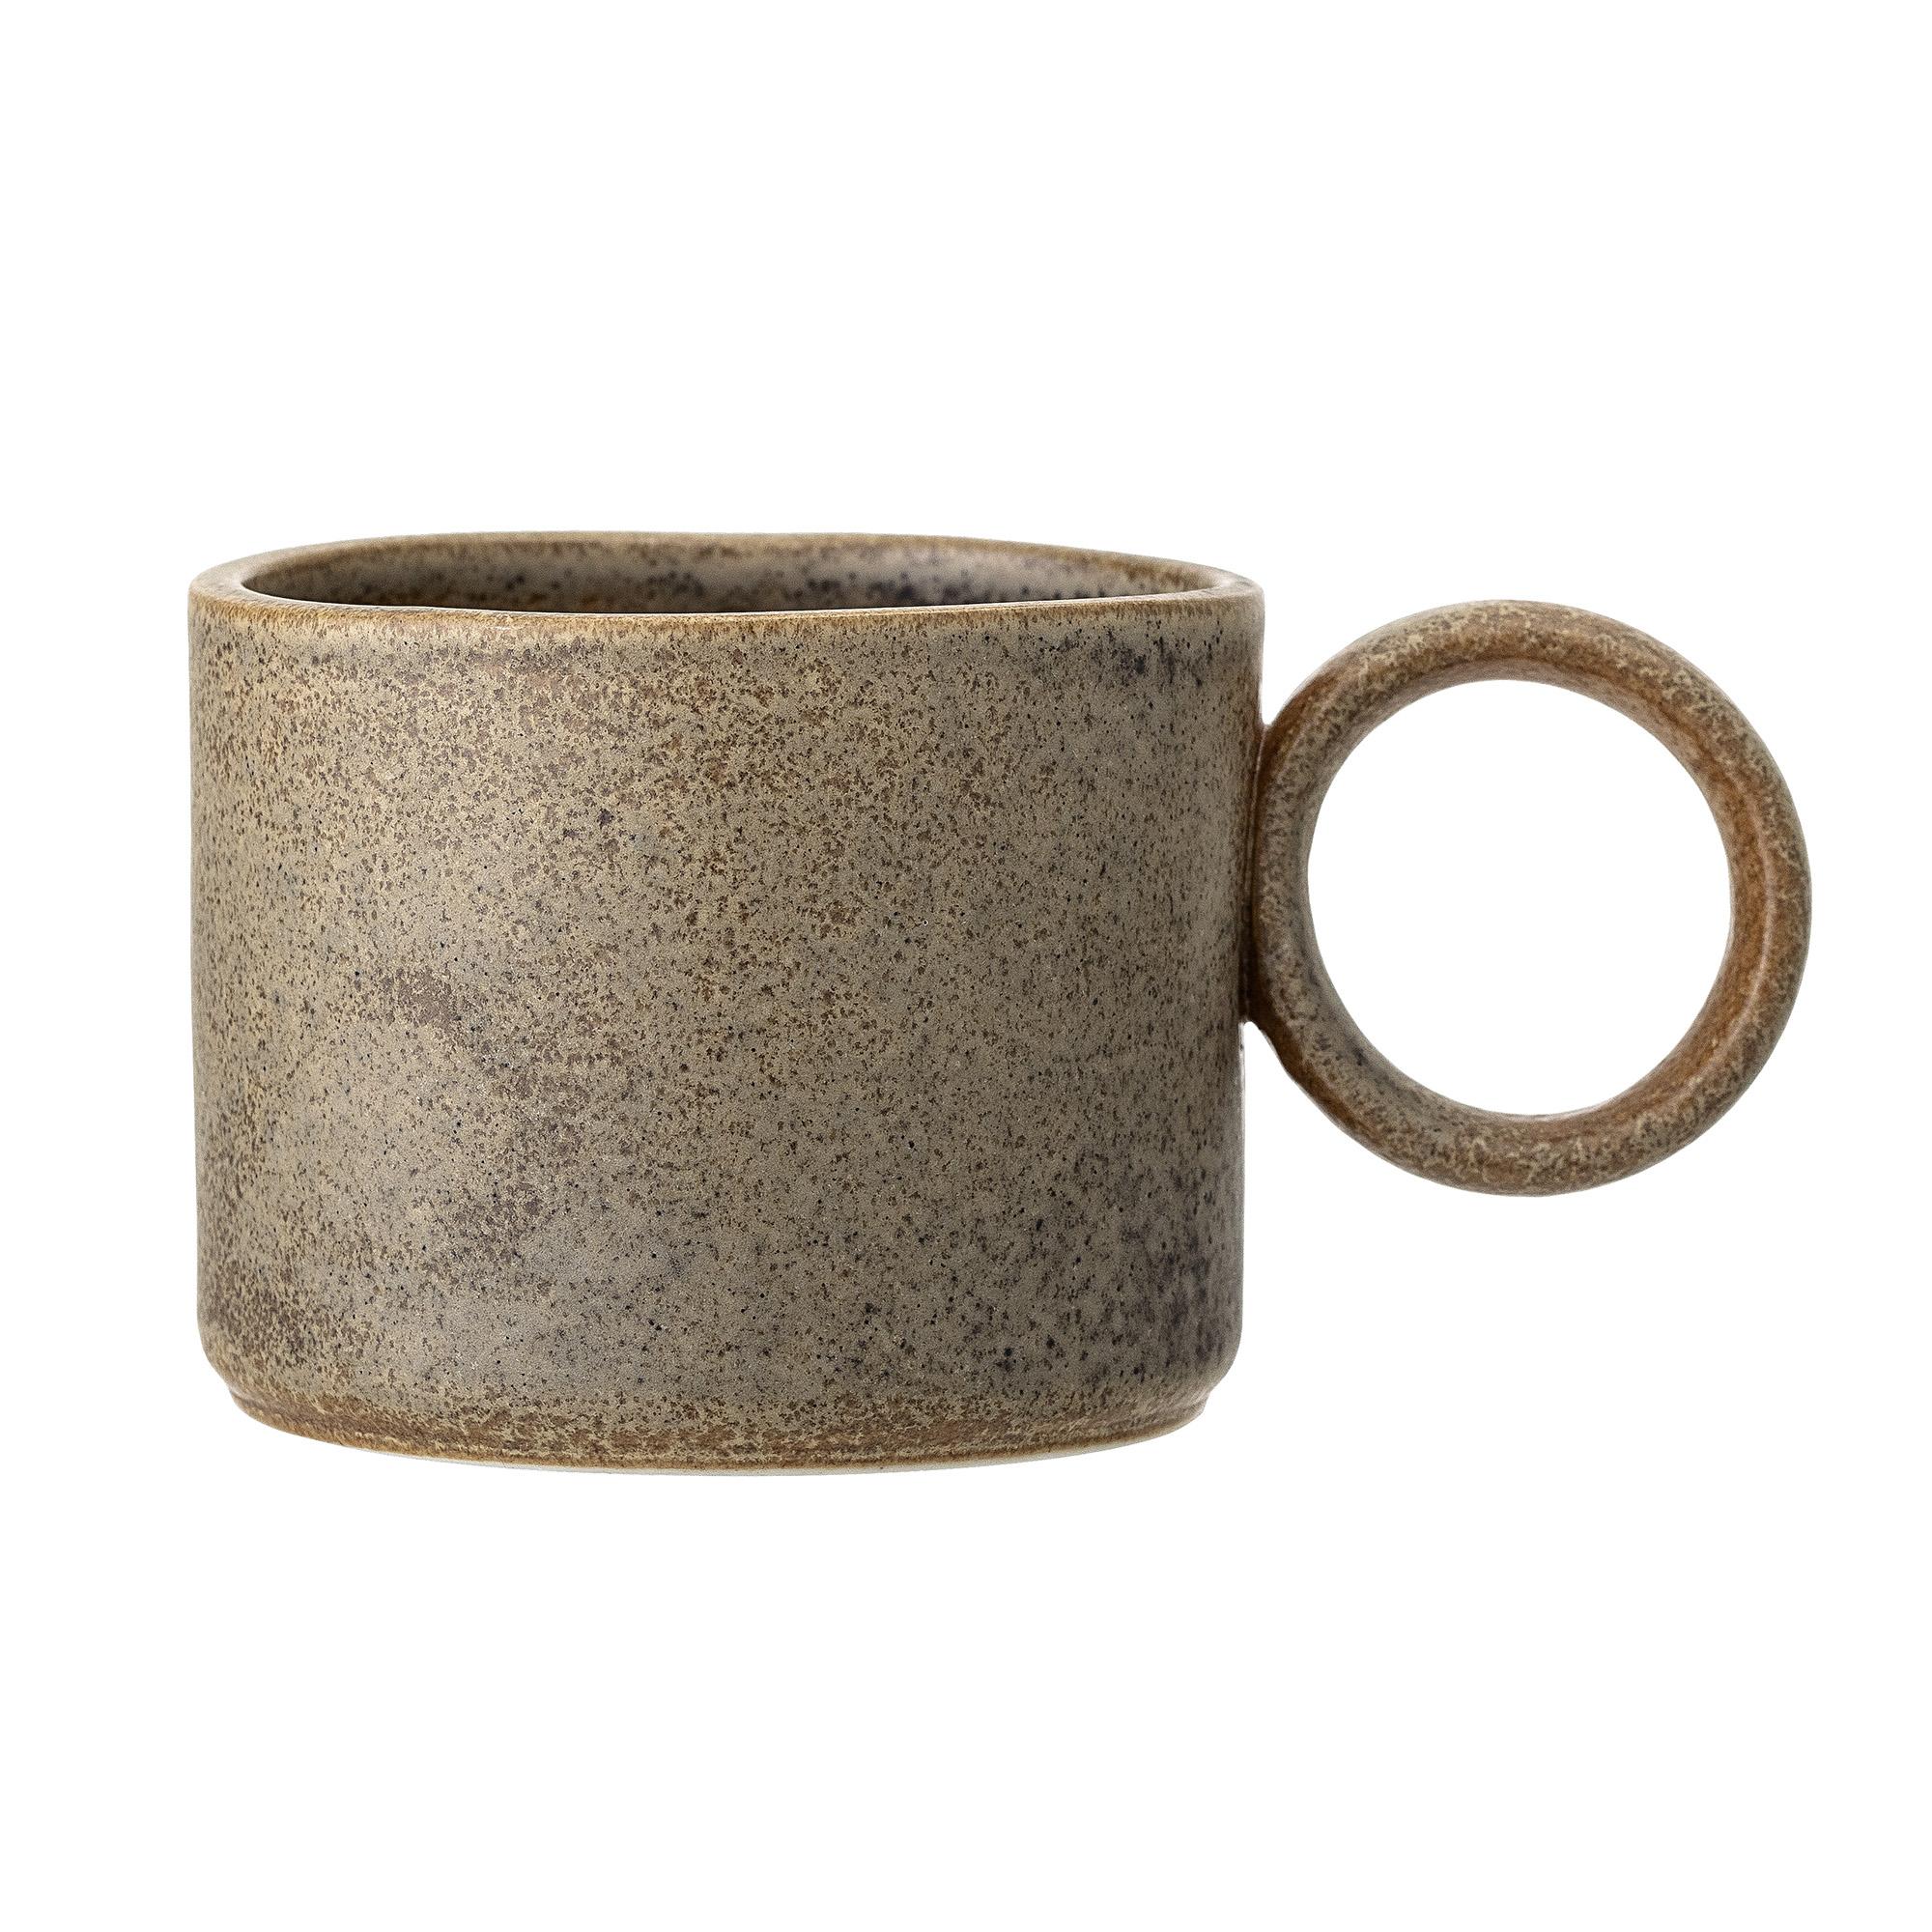 Circle handle coffee cup